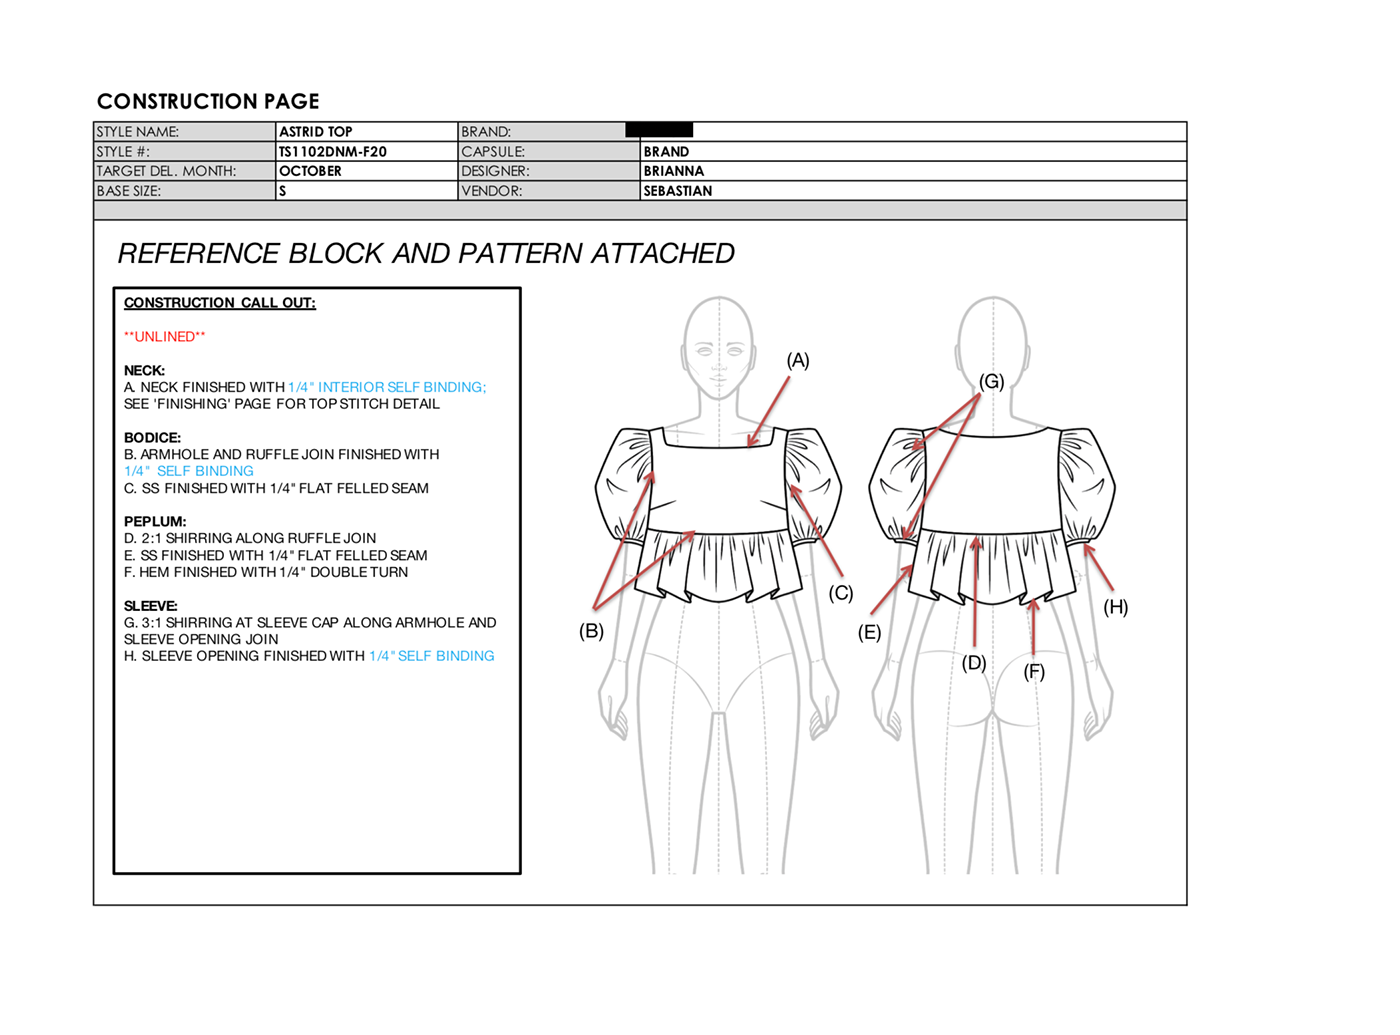 cad CAD SKETCH fashion illustration hand sketch moodboard photoshoot TECH PACKS